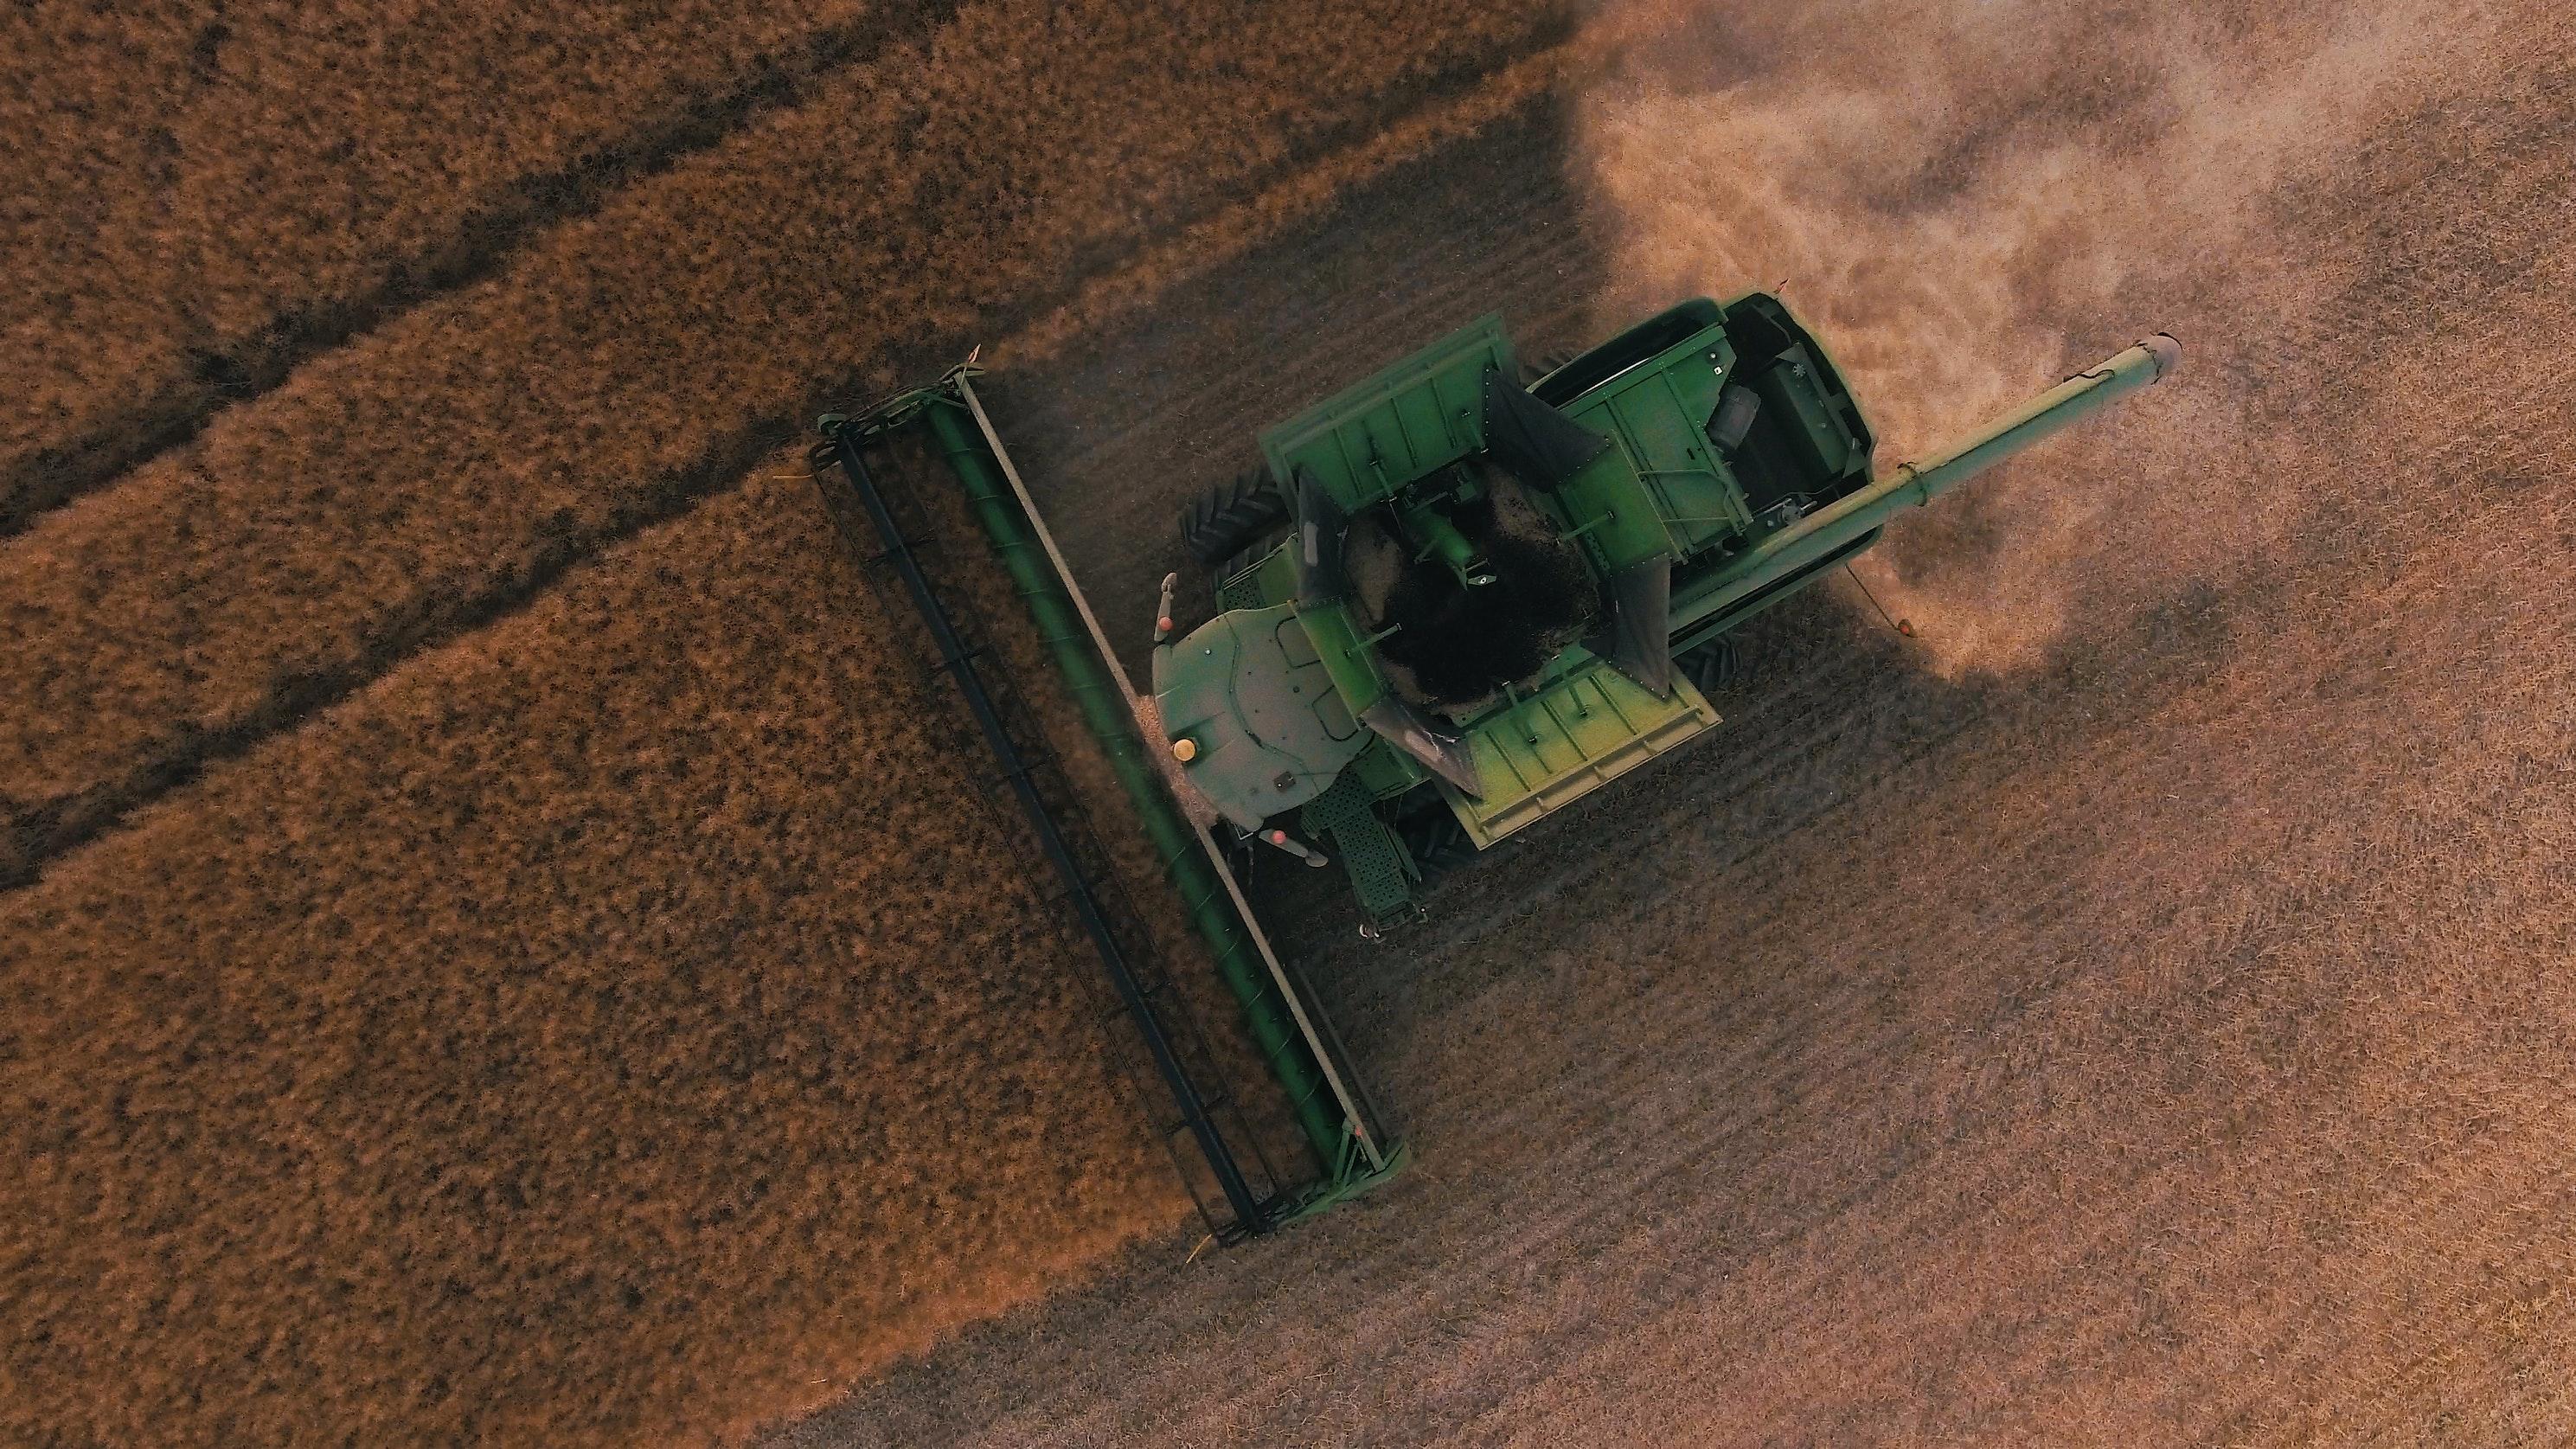 Hjälp bönder sälja sin Biometangas!